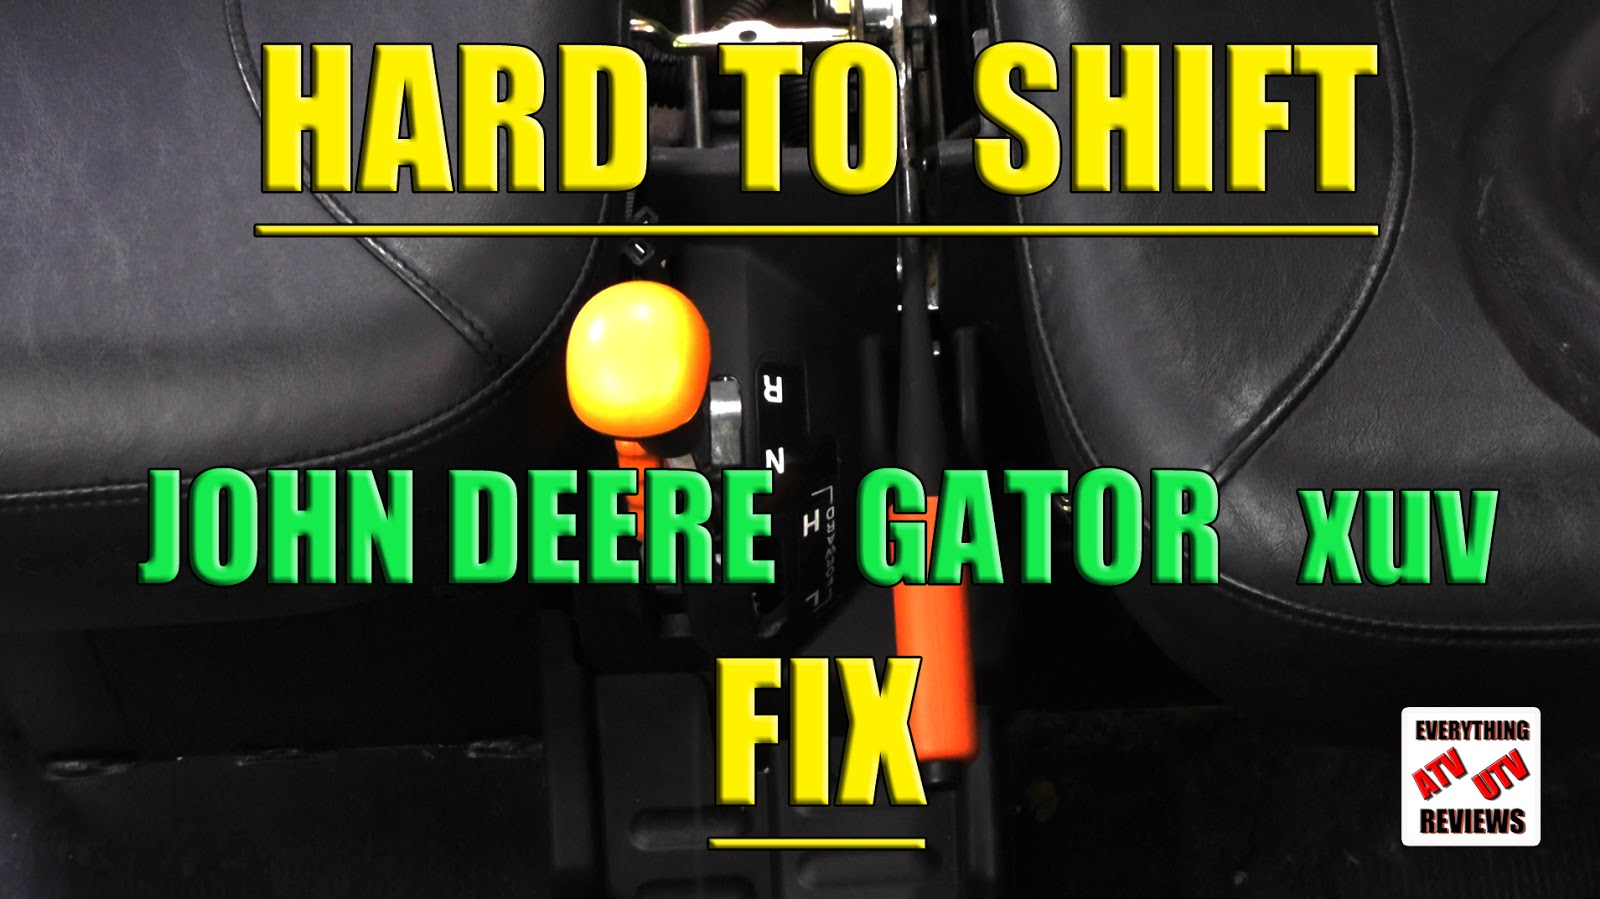 hight resolution of 2013 john deere gator 855d wiring diagram everything atv utv reviews john deere gator